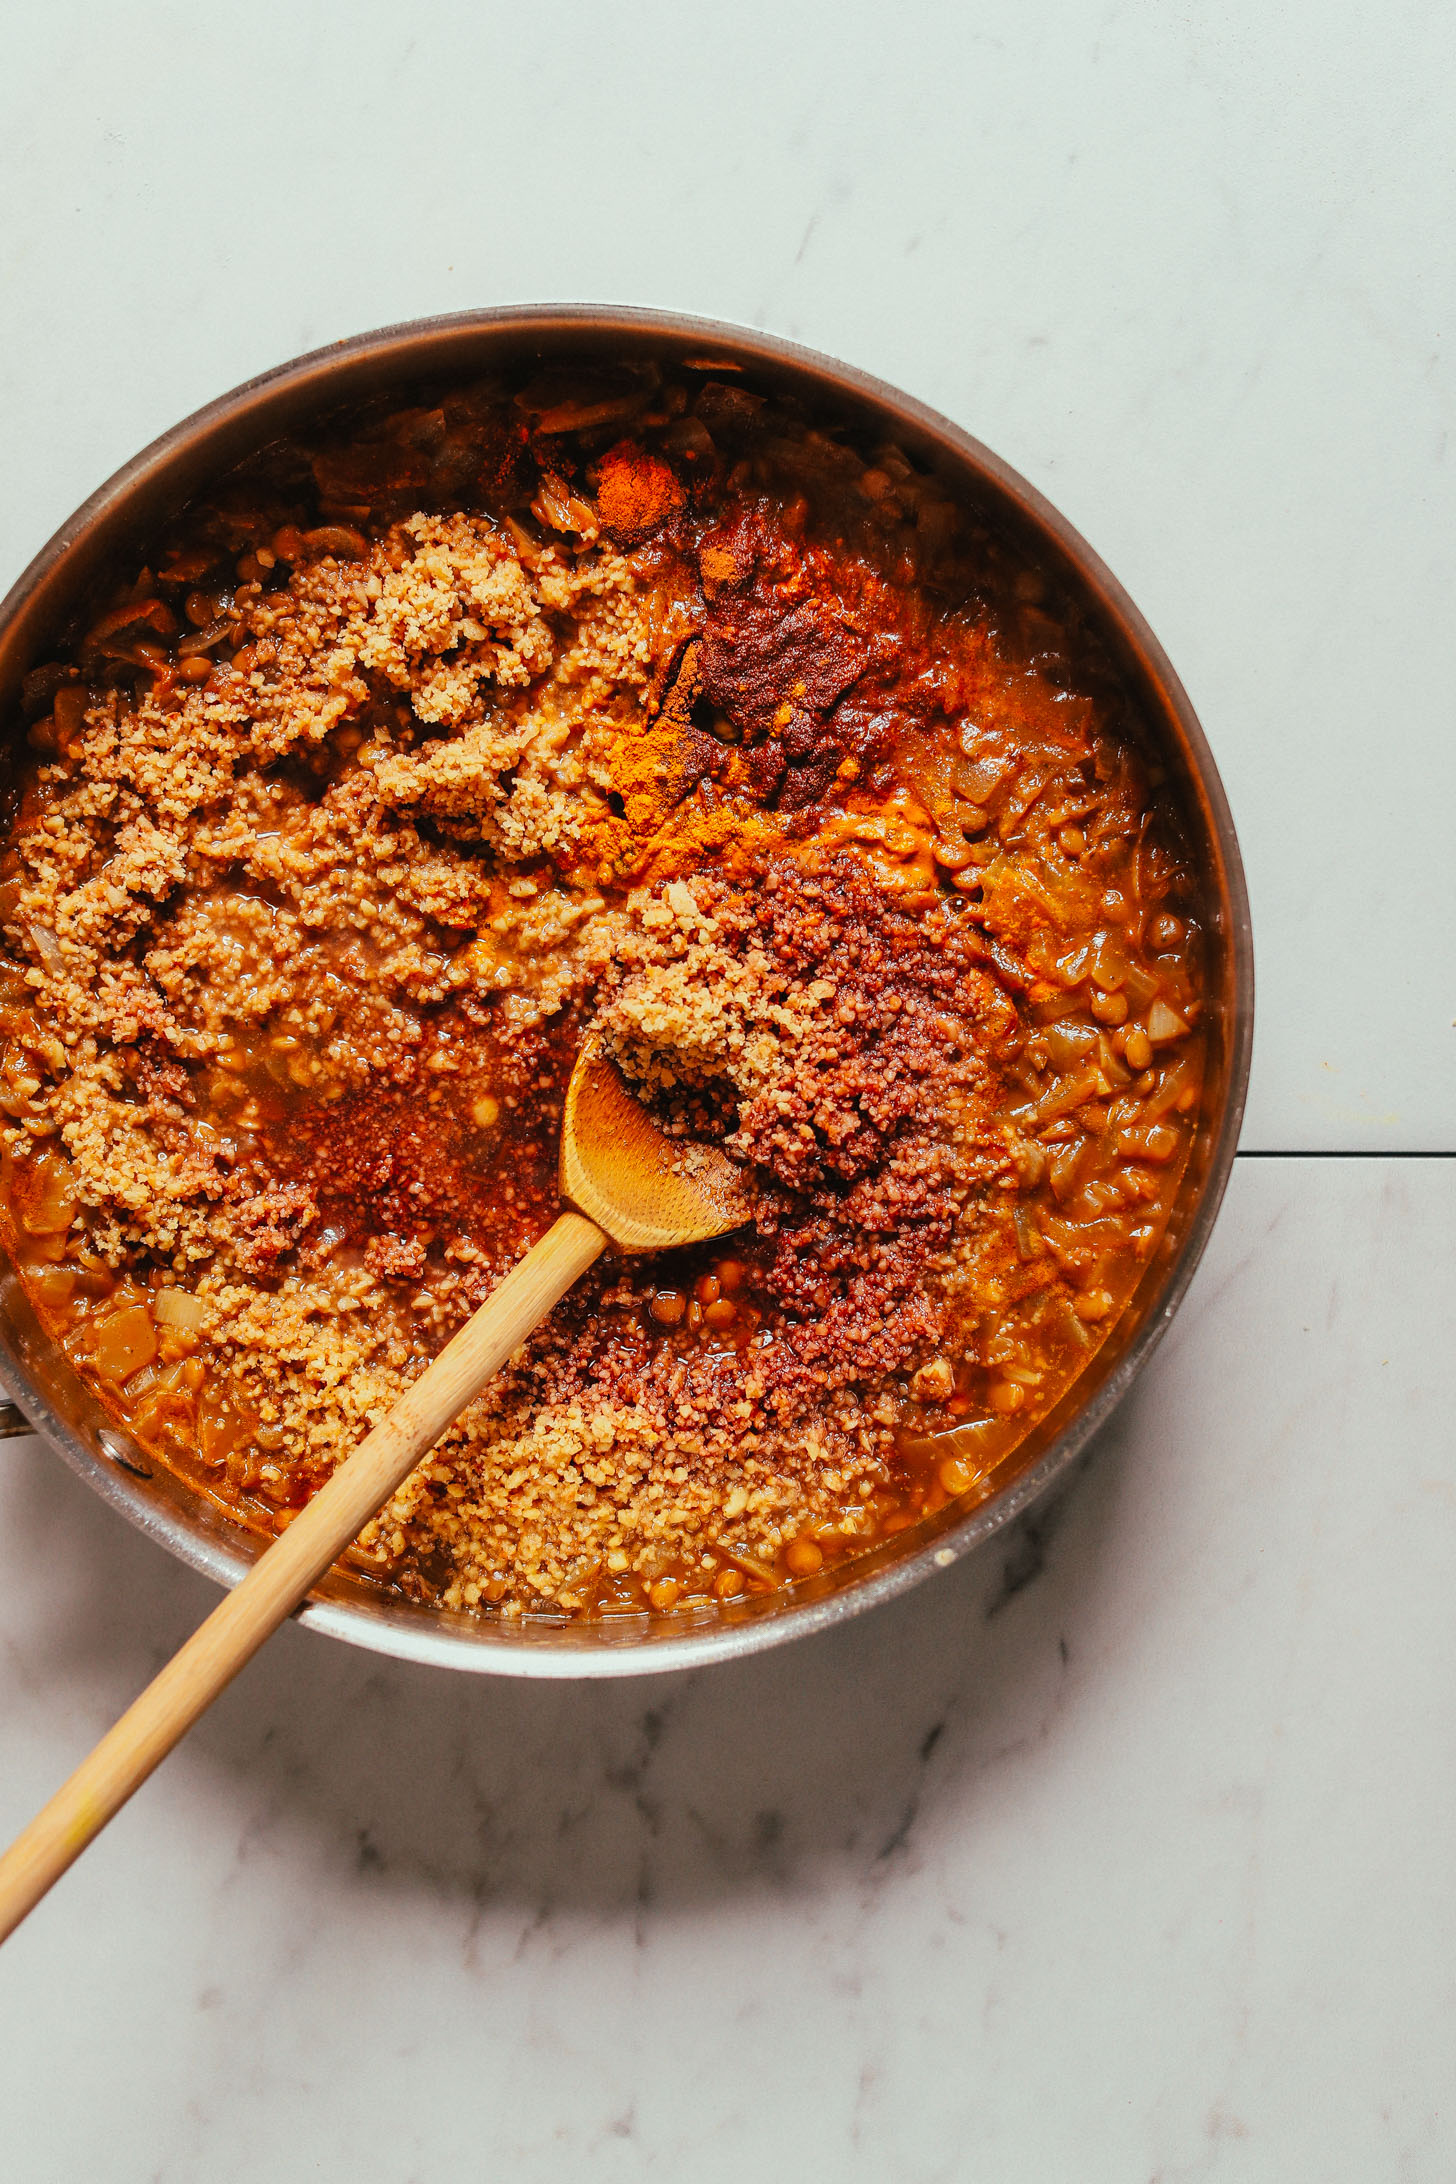 Stirring a skillet of our satisfying vegan Lentil Fesenjan recipe